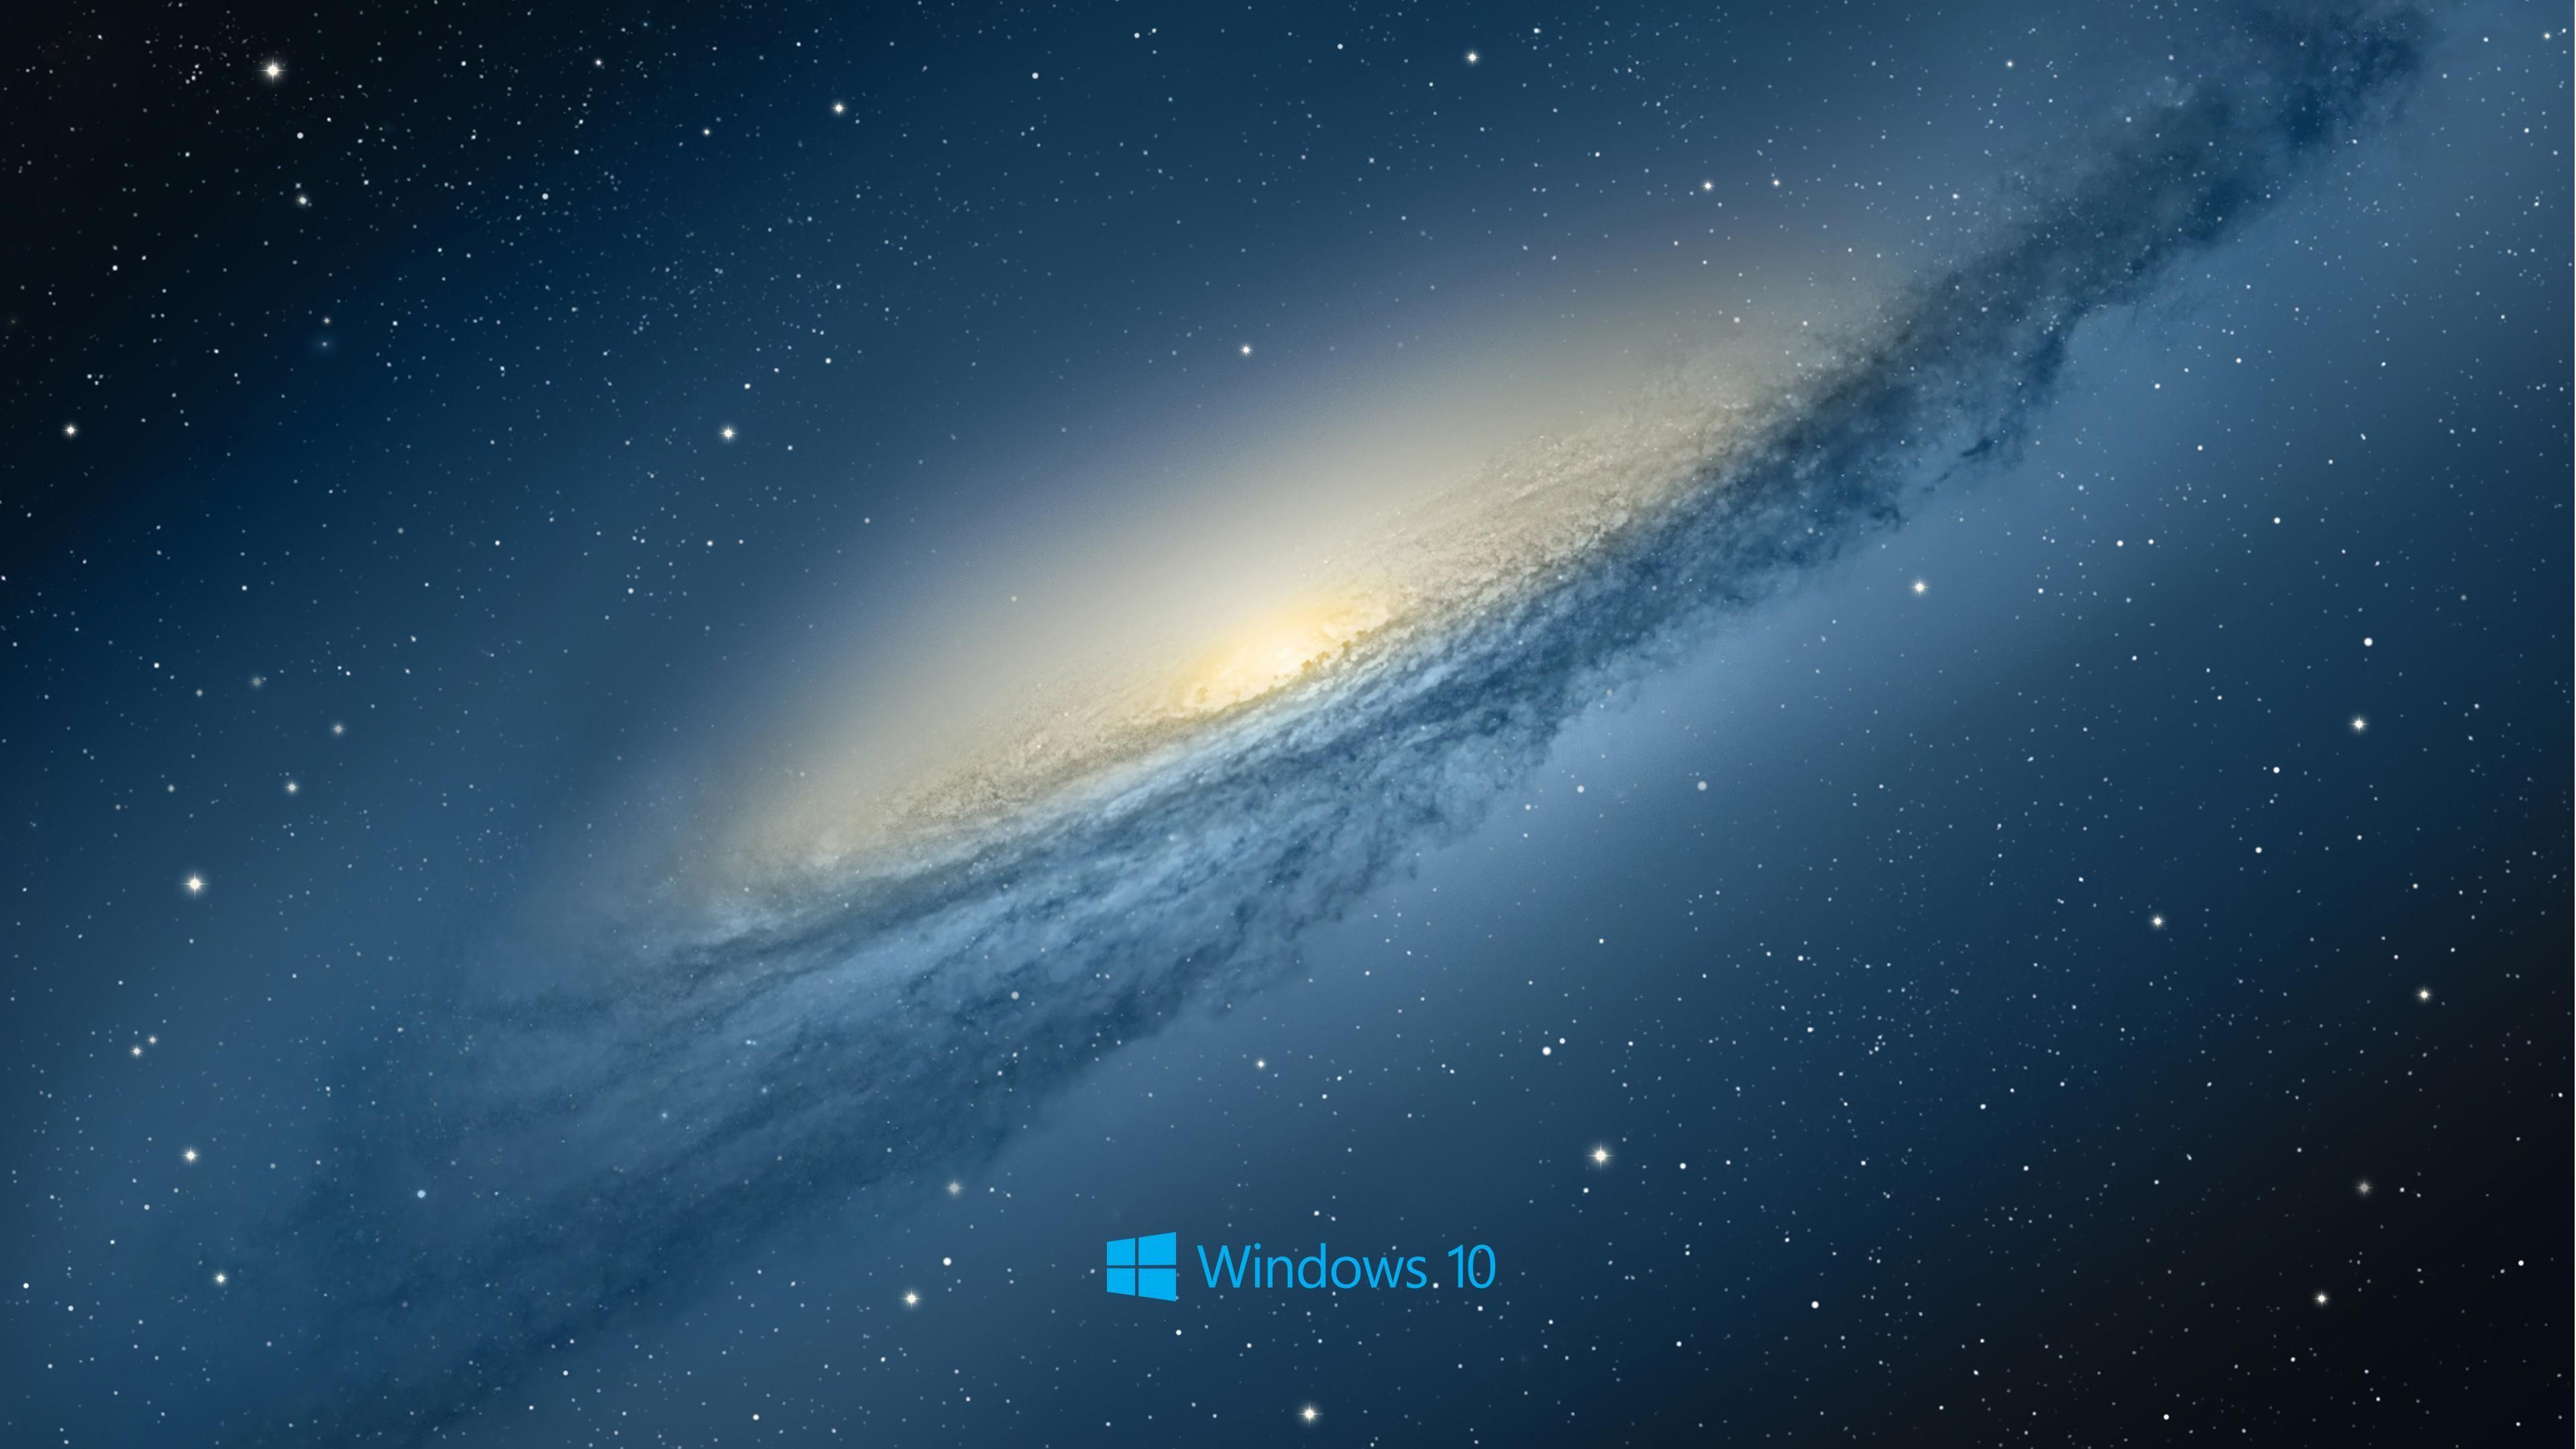 Windows 10 Wallpaper 4k 74155 Wallpaper Windows 10 Ultra Hd 4k Wallpaper 4k Wallpapers For Pc